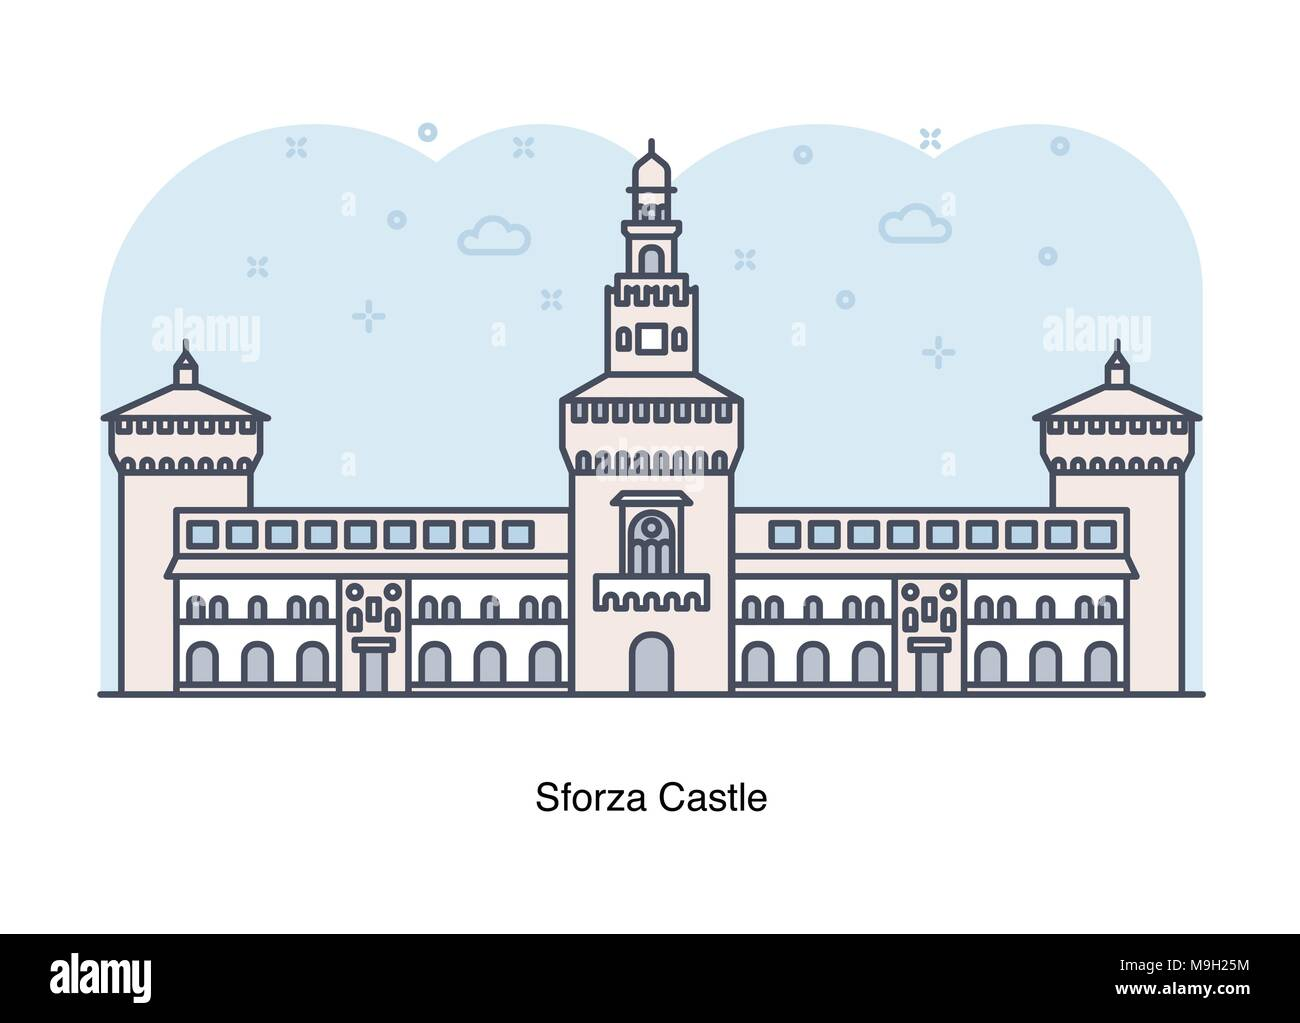 Vector line illustration of Sforza Castle , Milan, Italy. - Stock Vector